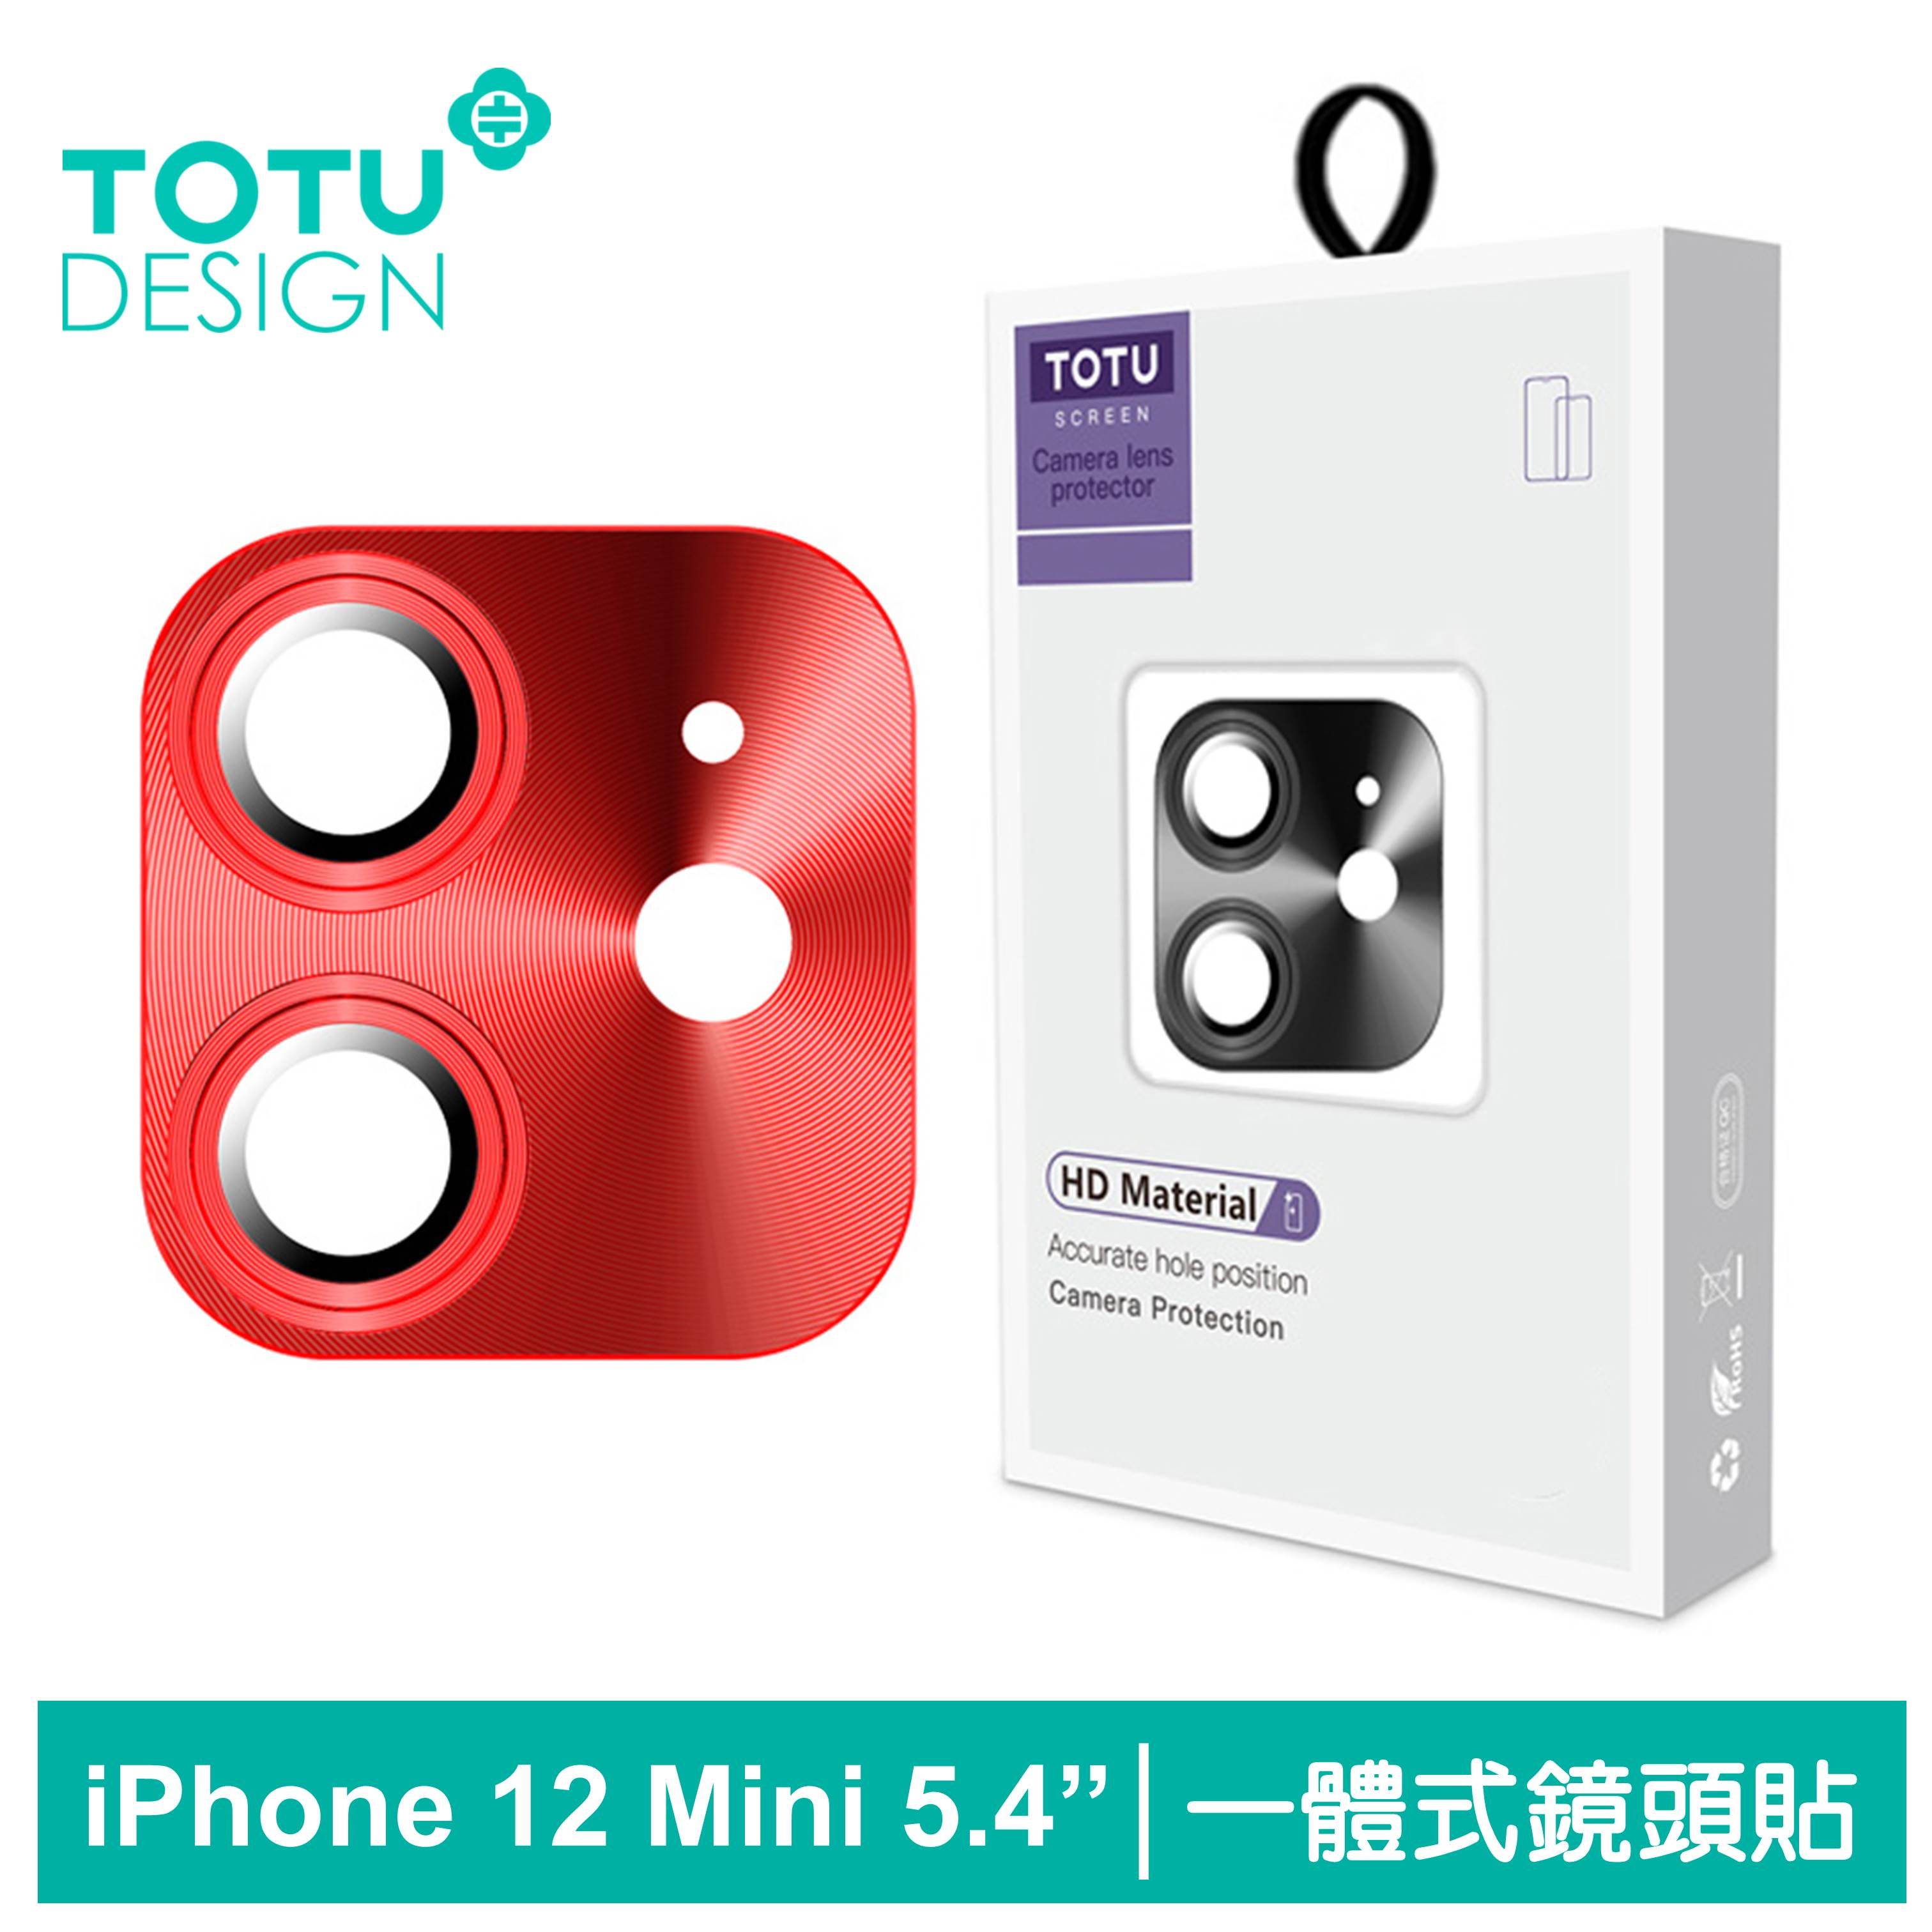 TOTU台灣官方 iPhone 12 Mini 鏡頭貼 i12 Mini 5.4吋 鋼化膜 保護貼 一體式鋁合金鋼化玻璃 鎧甲系列 紅色